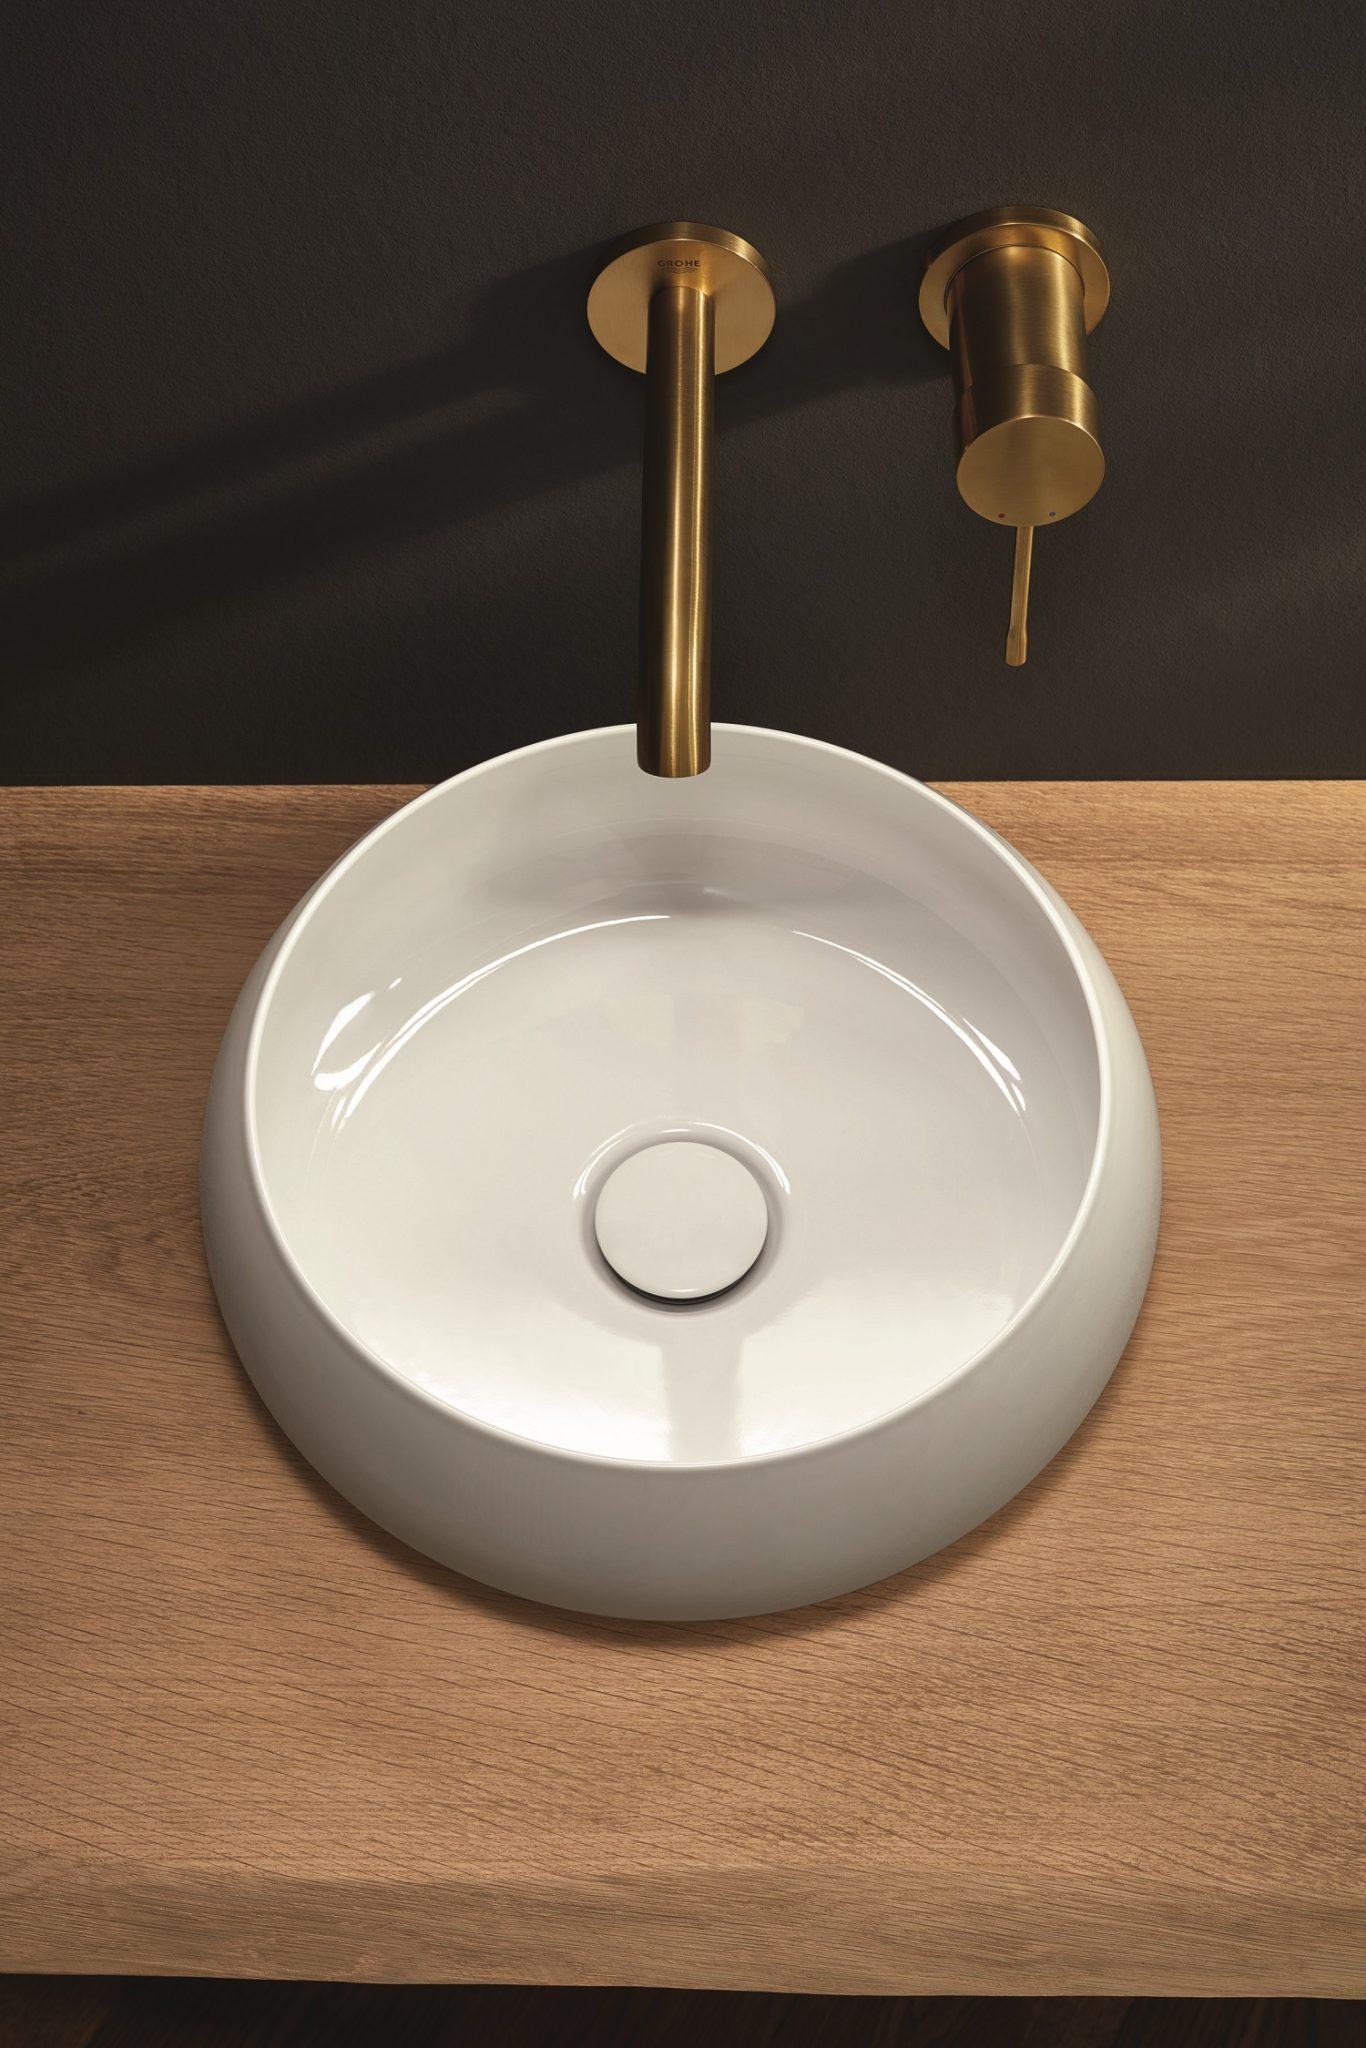 Bette BetteCraft Covid-safe bathrooms